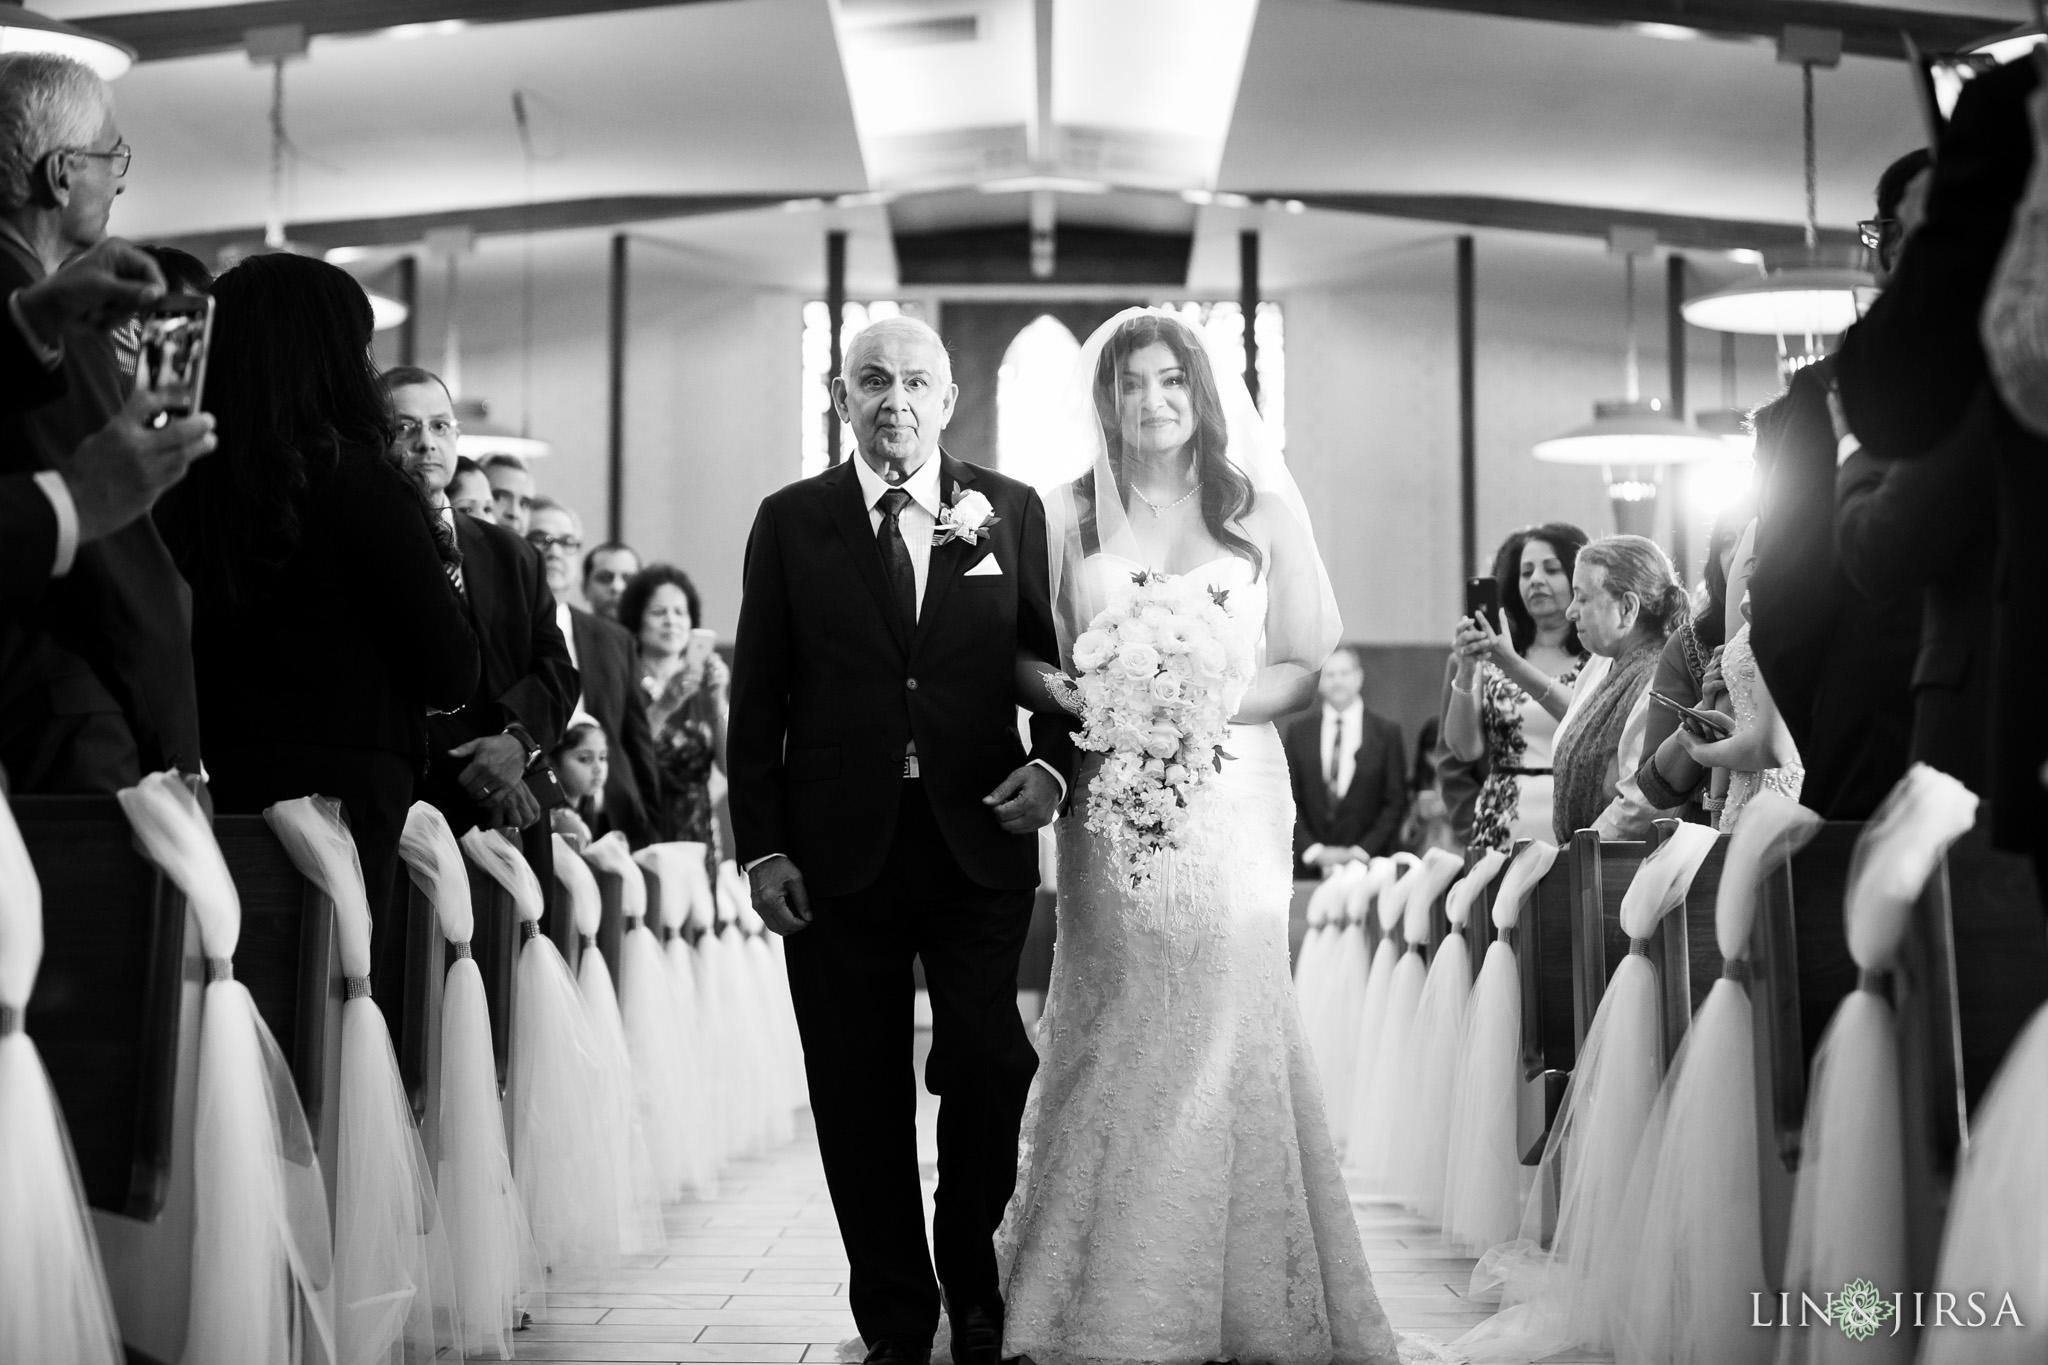 14 St Juliana Falconieri Church Fullerton Wedding Photography